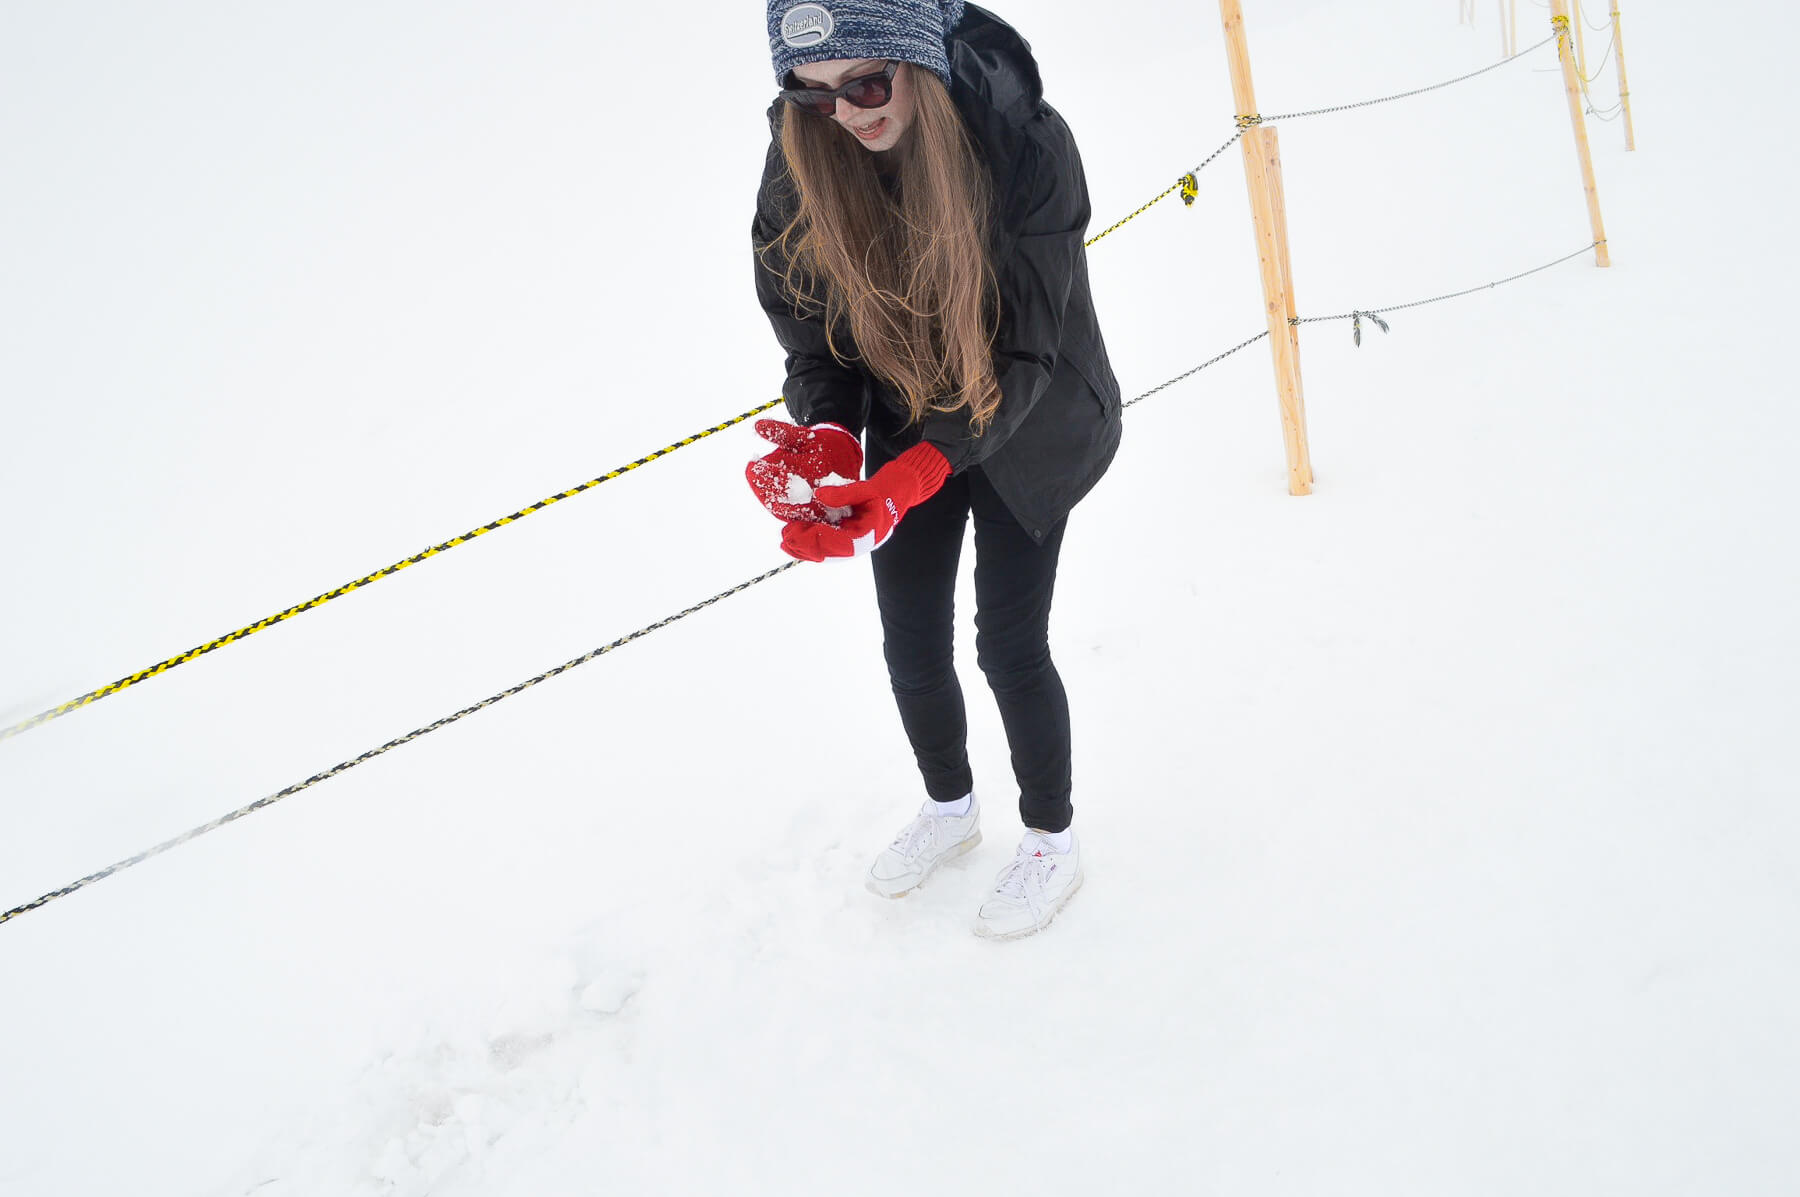 Girl building a snow ball at Jungfraujoch, Switzerland